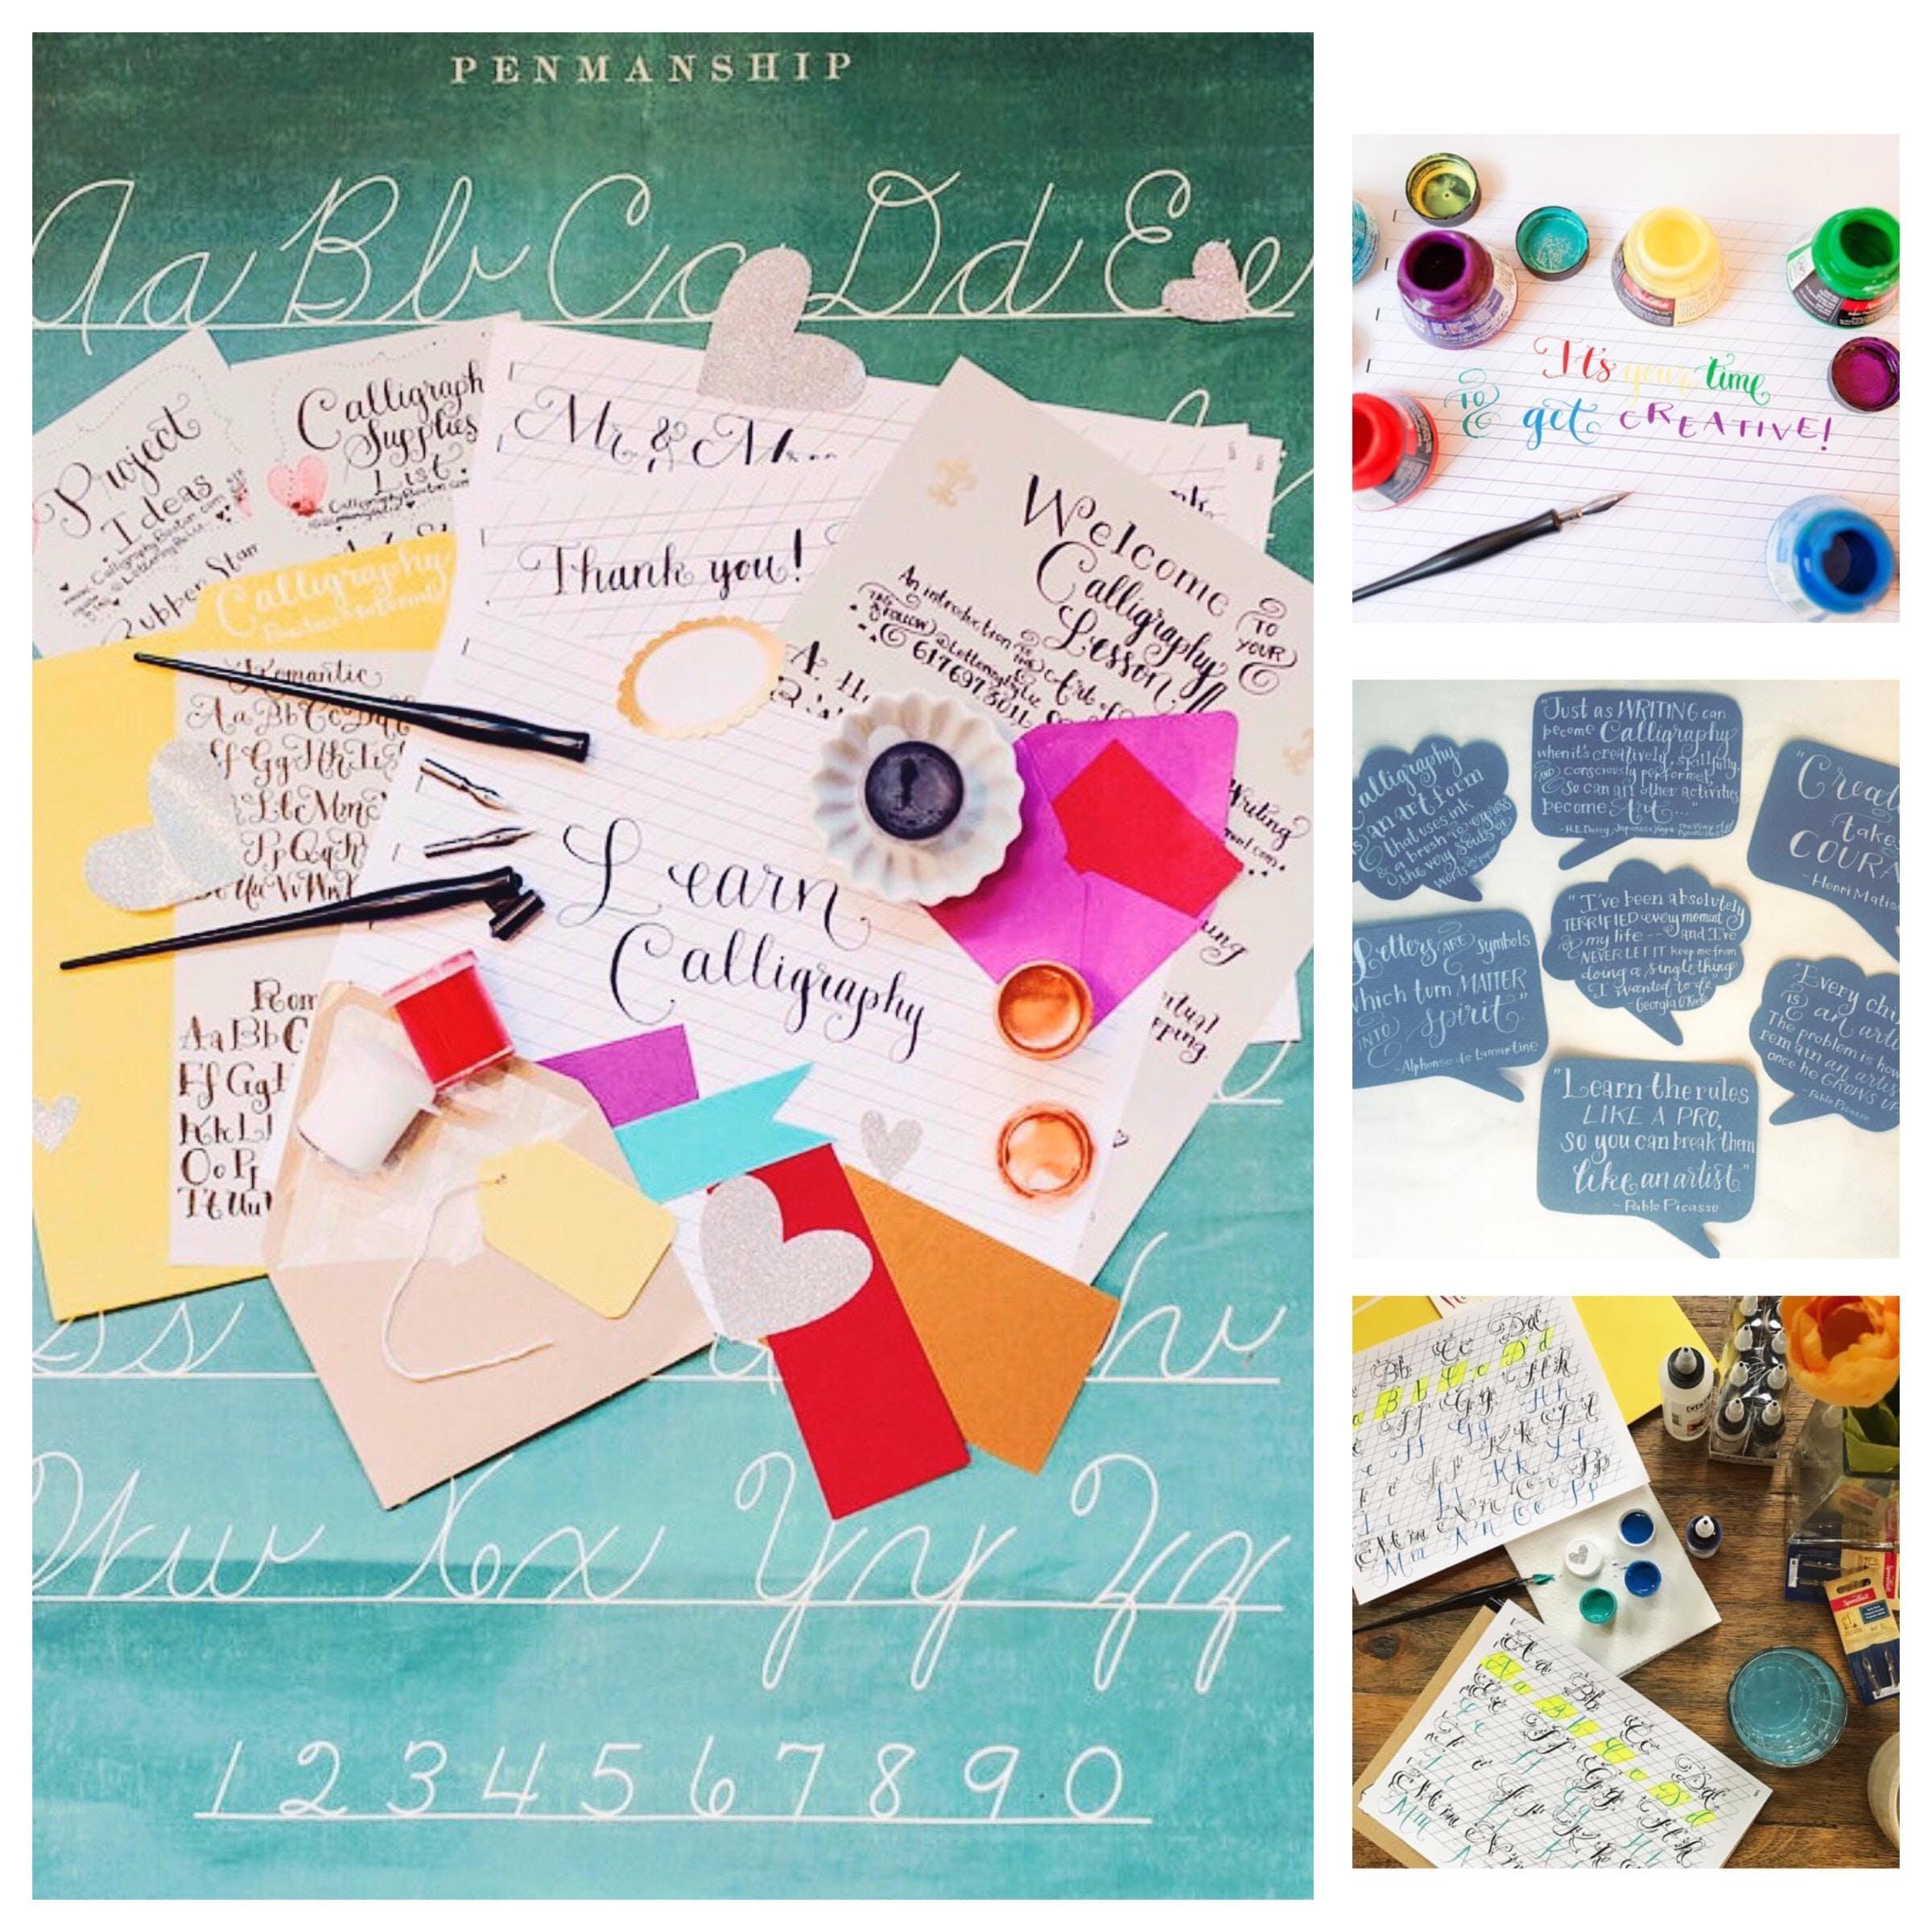 level 2 workshops in boston envelope art placecards chalk mirror